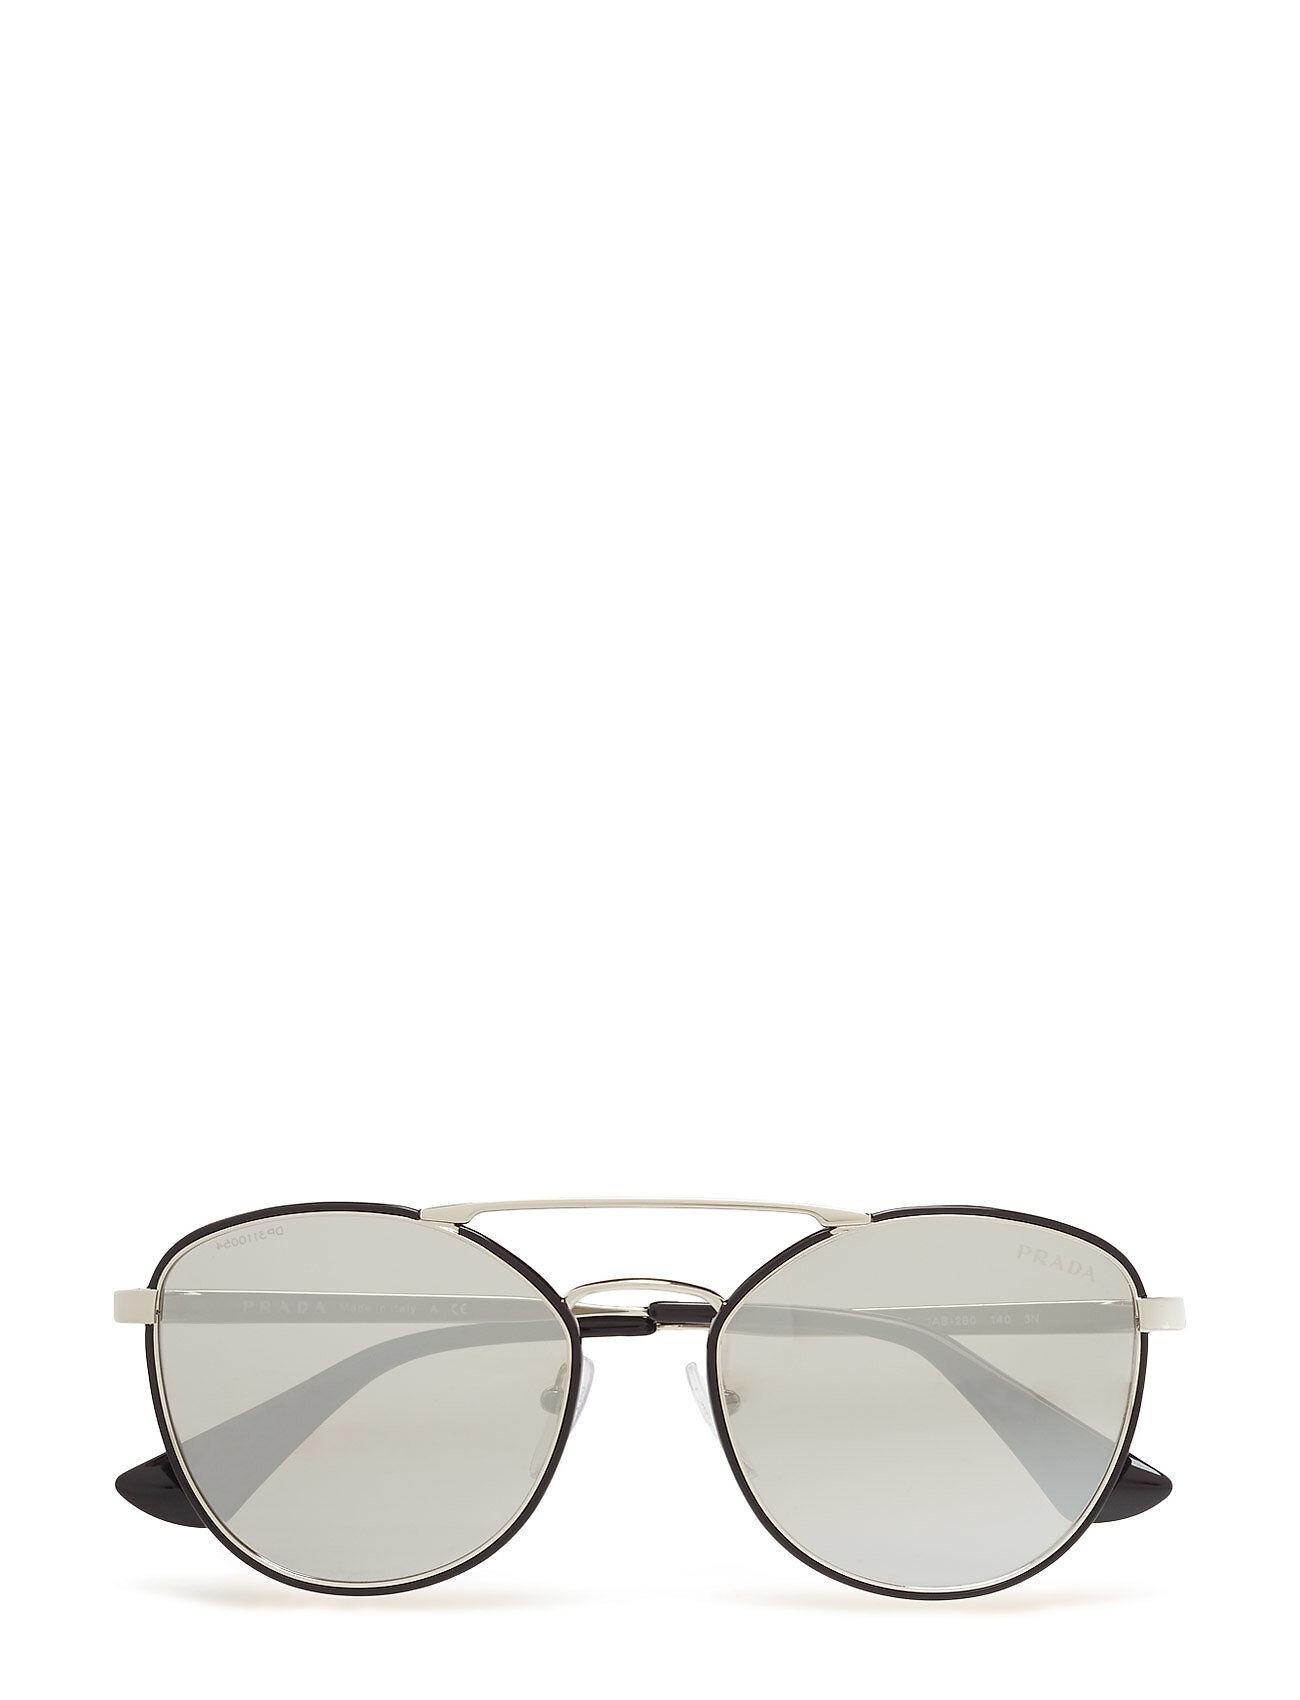 Image of Prada Sunglasses Not Defined Aurinkolasit Musta